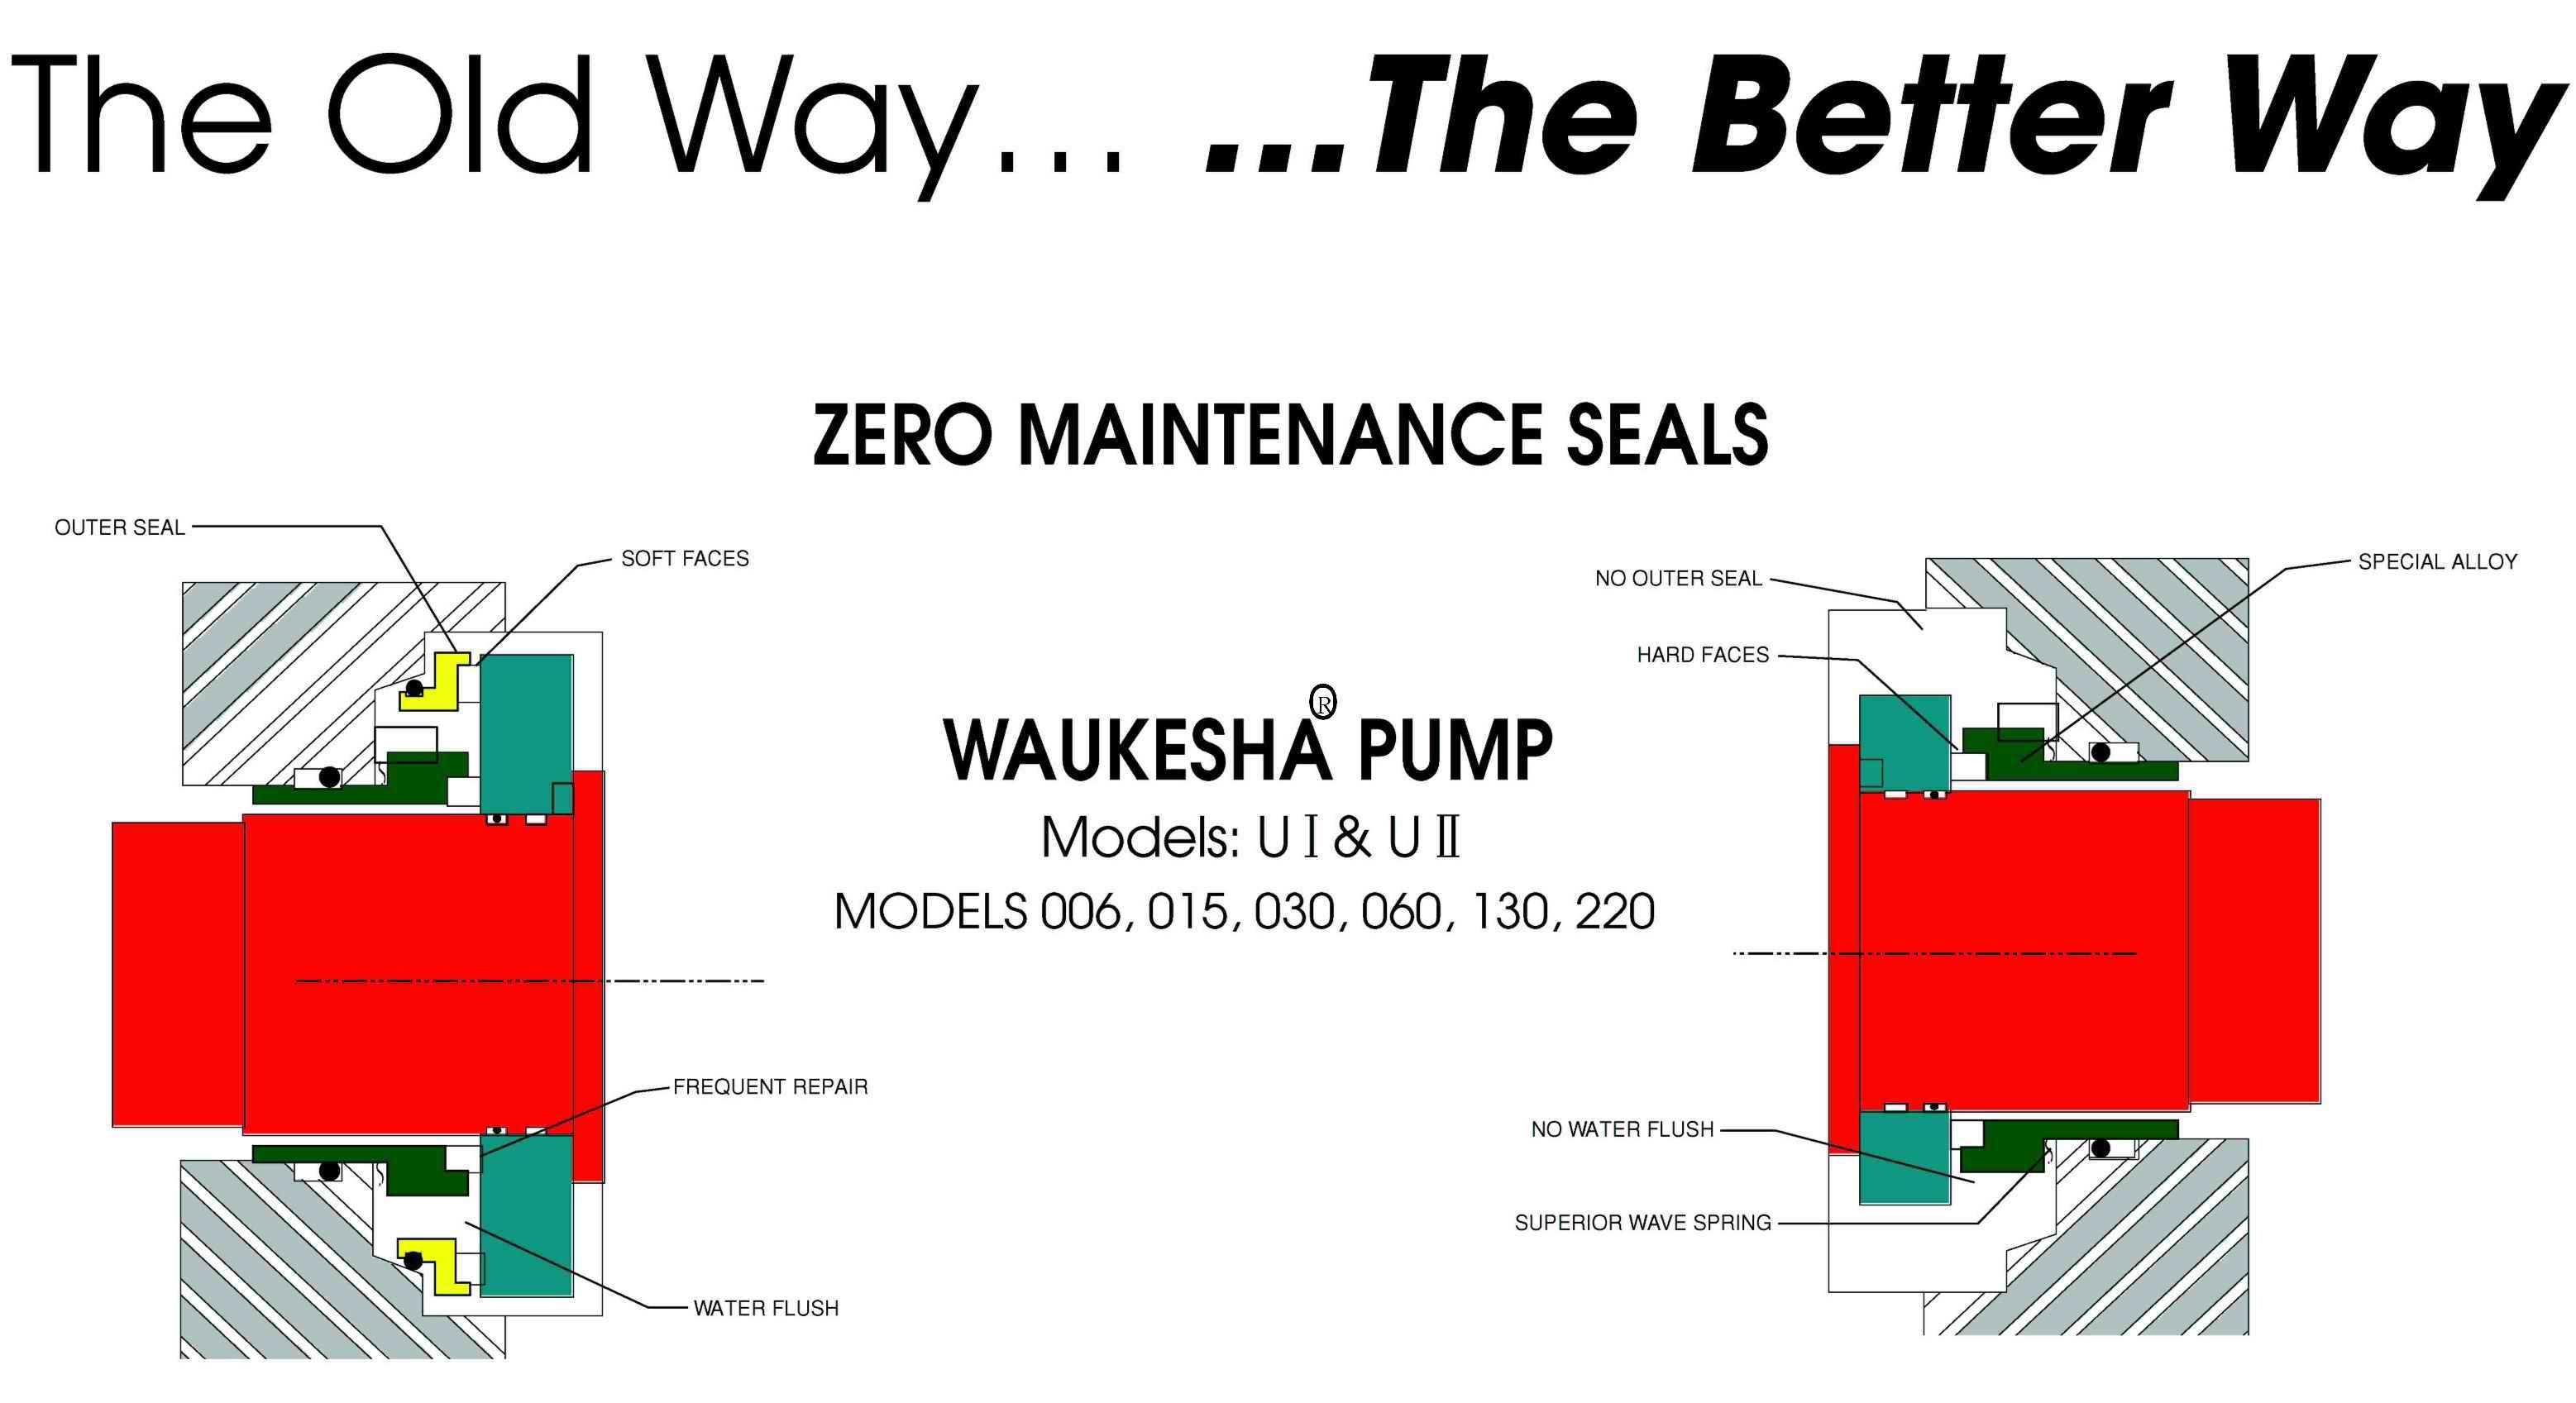 Waukesha seal Comparison